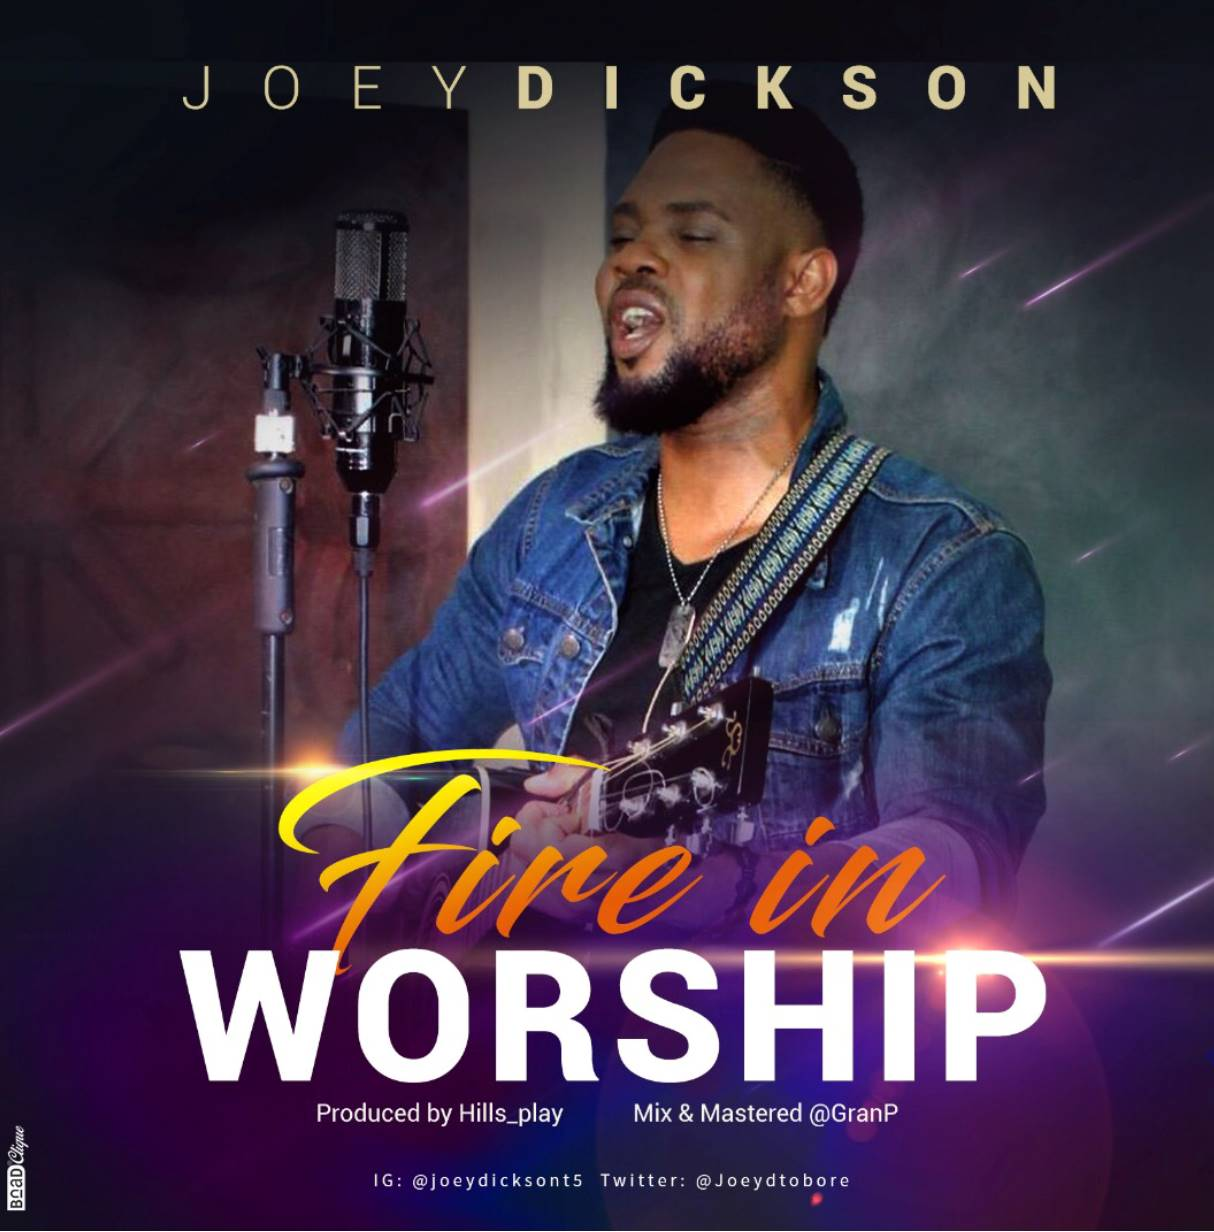 Joey Dickson Fire In Worship